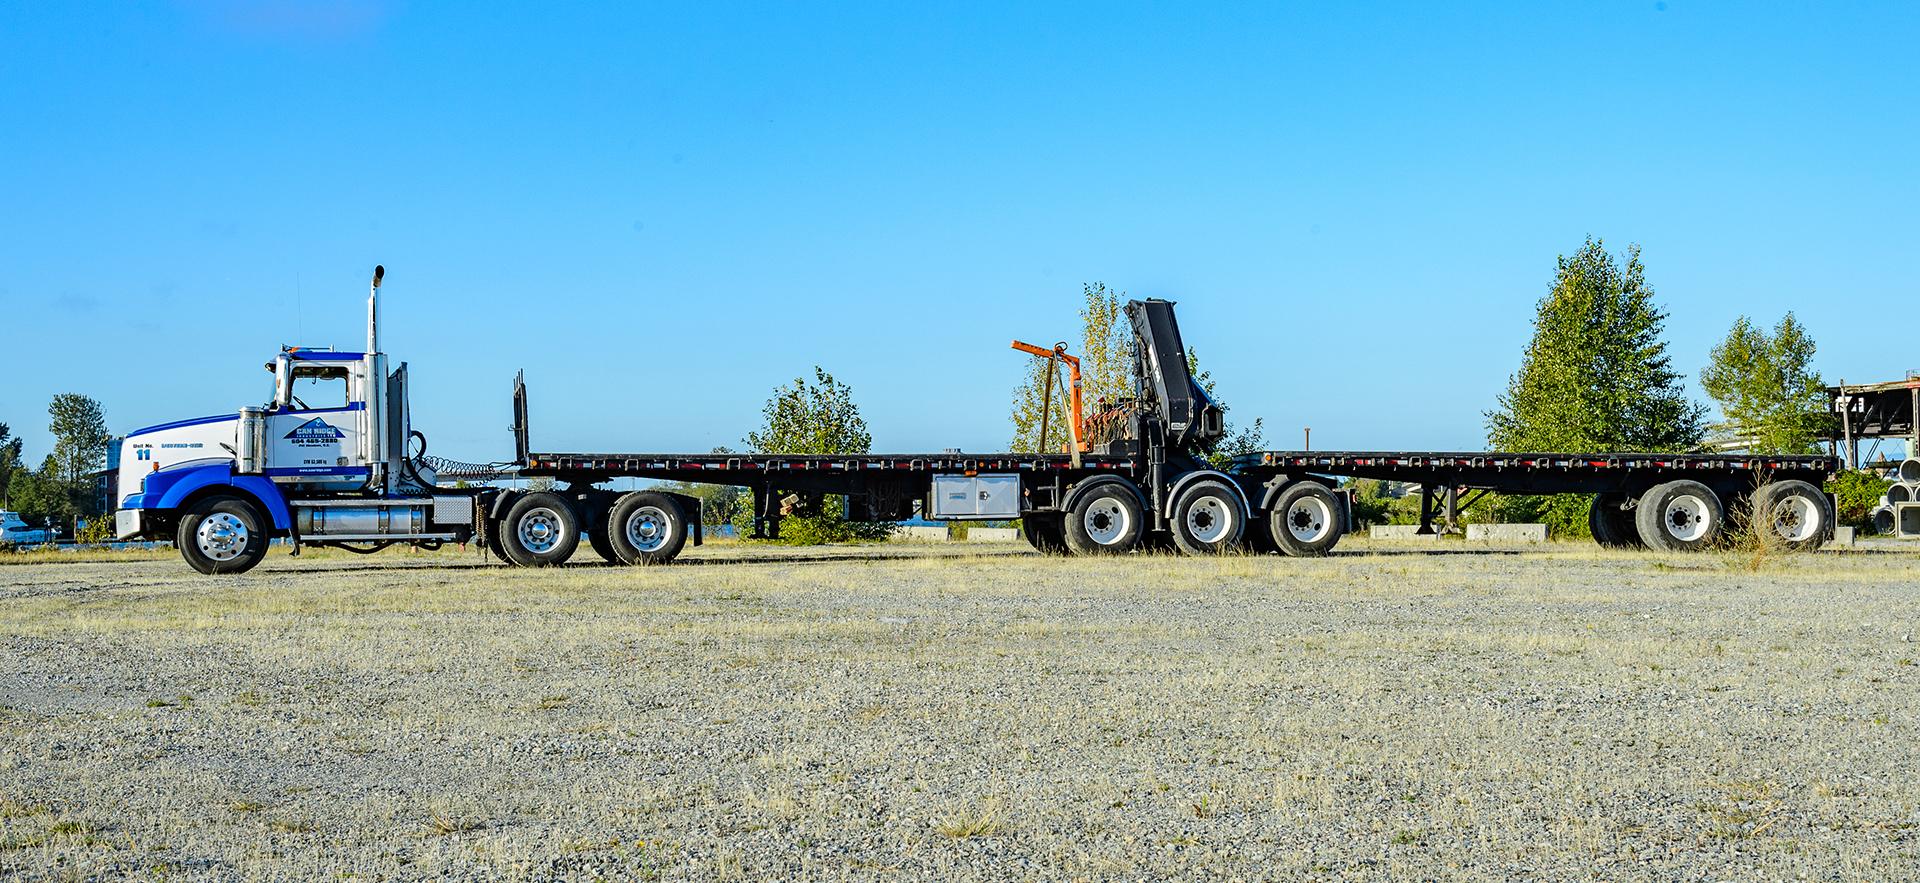 Concrete Retaining Walls, Blocks & Barriers | Train & Transportation Company | Can Ridge Industries Ltd.